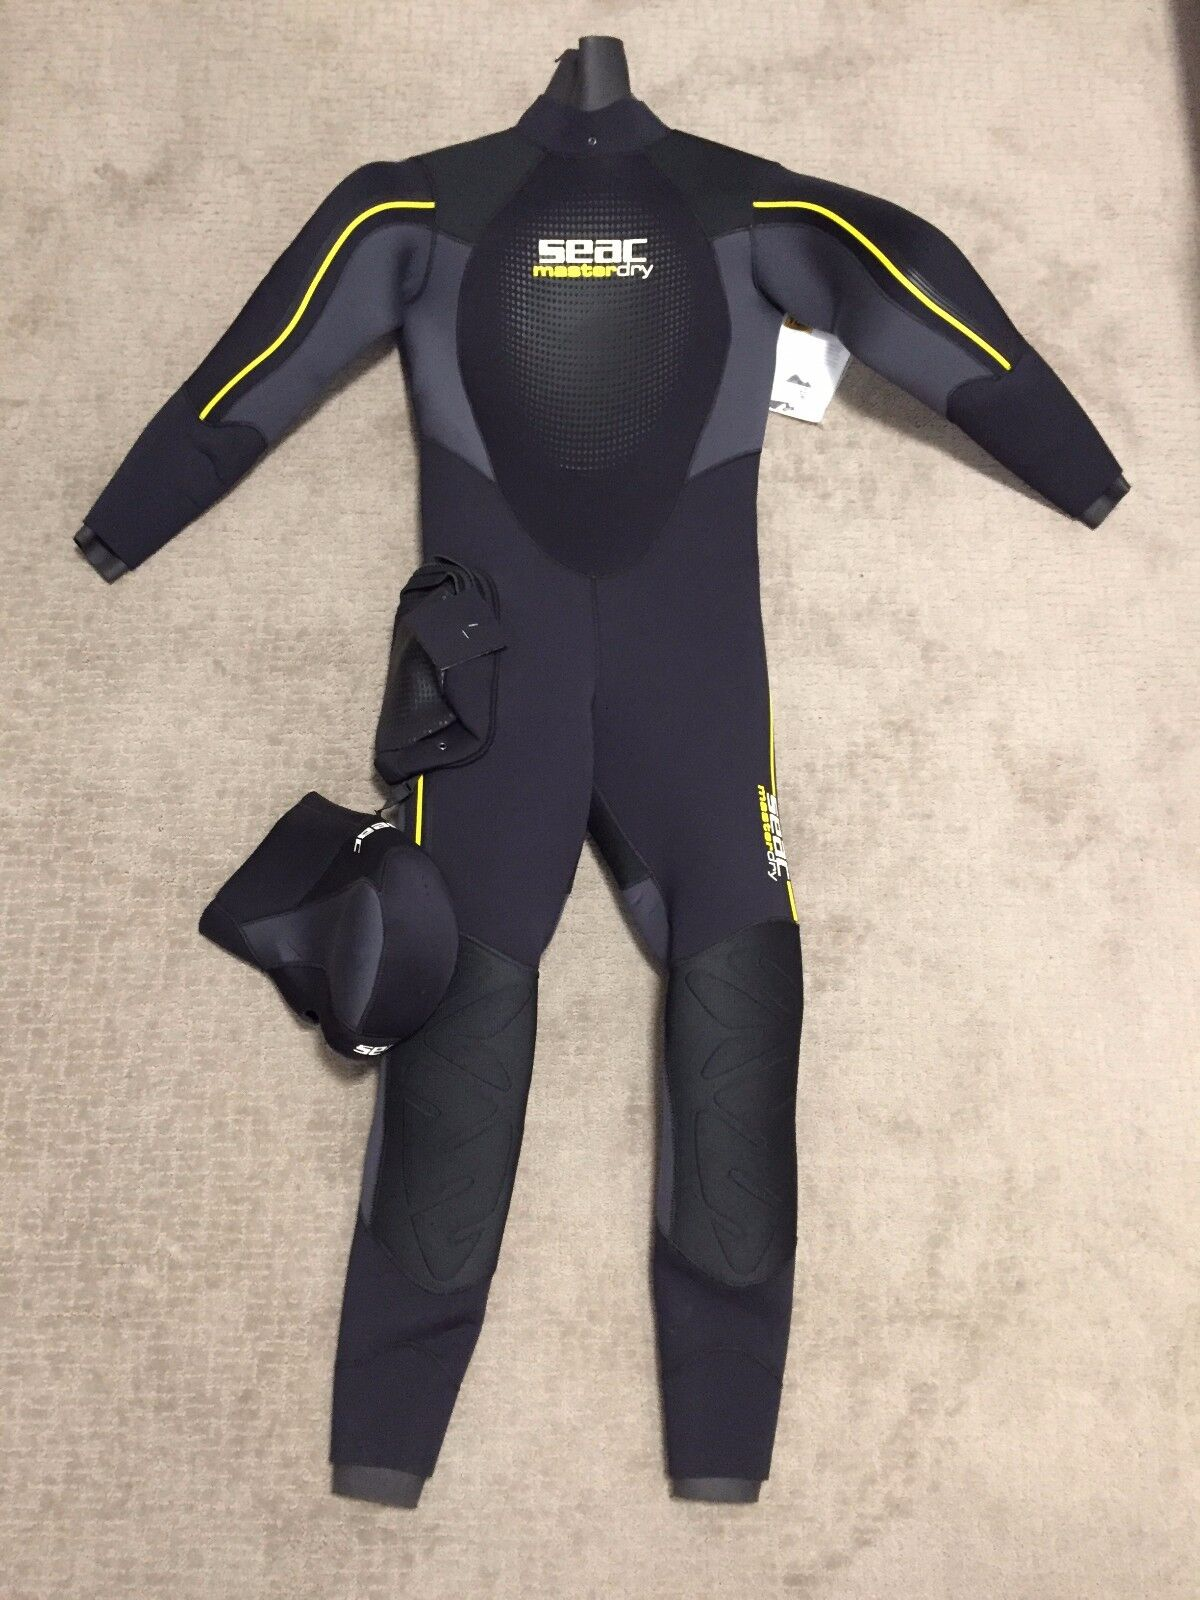 Seac Masterdry Semi-dry Wetsuit Man 7 mm sz M